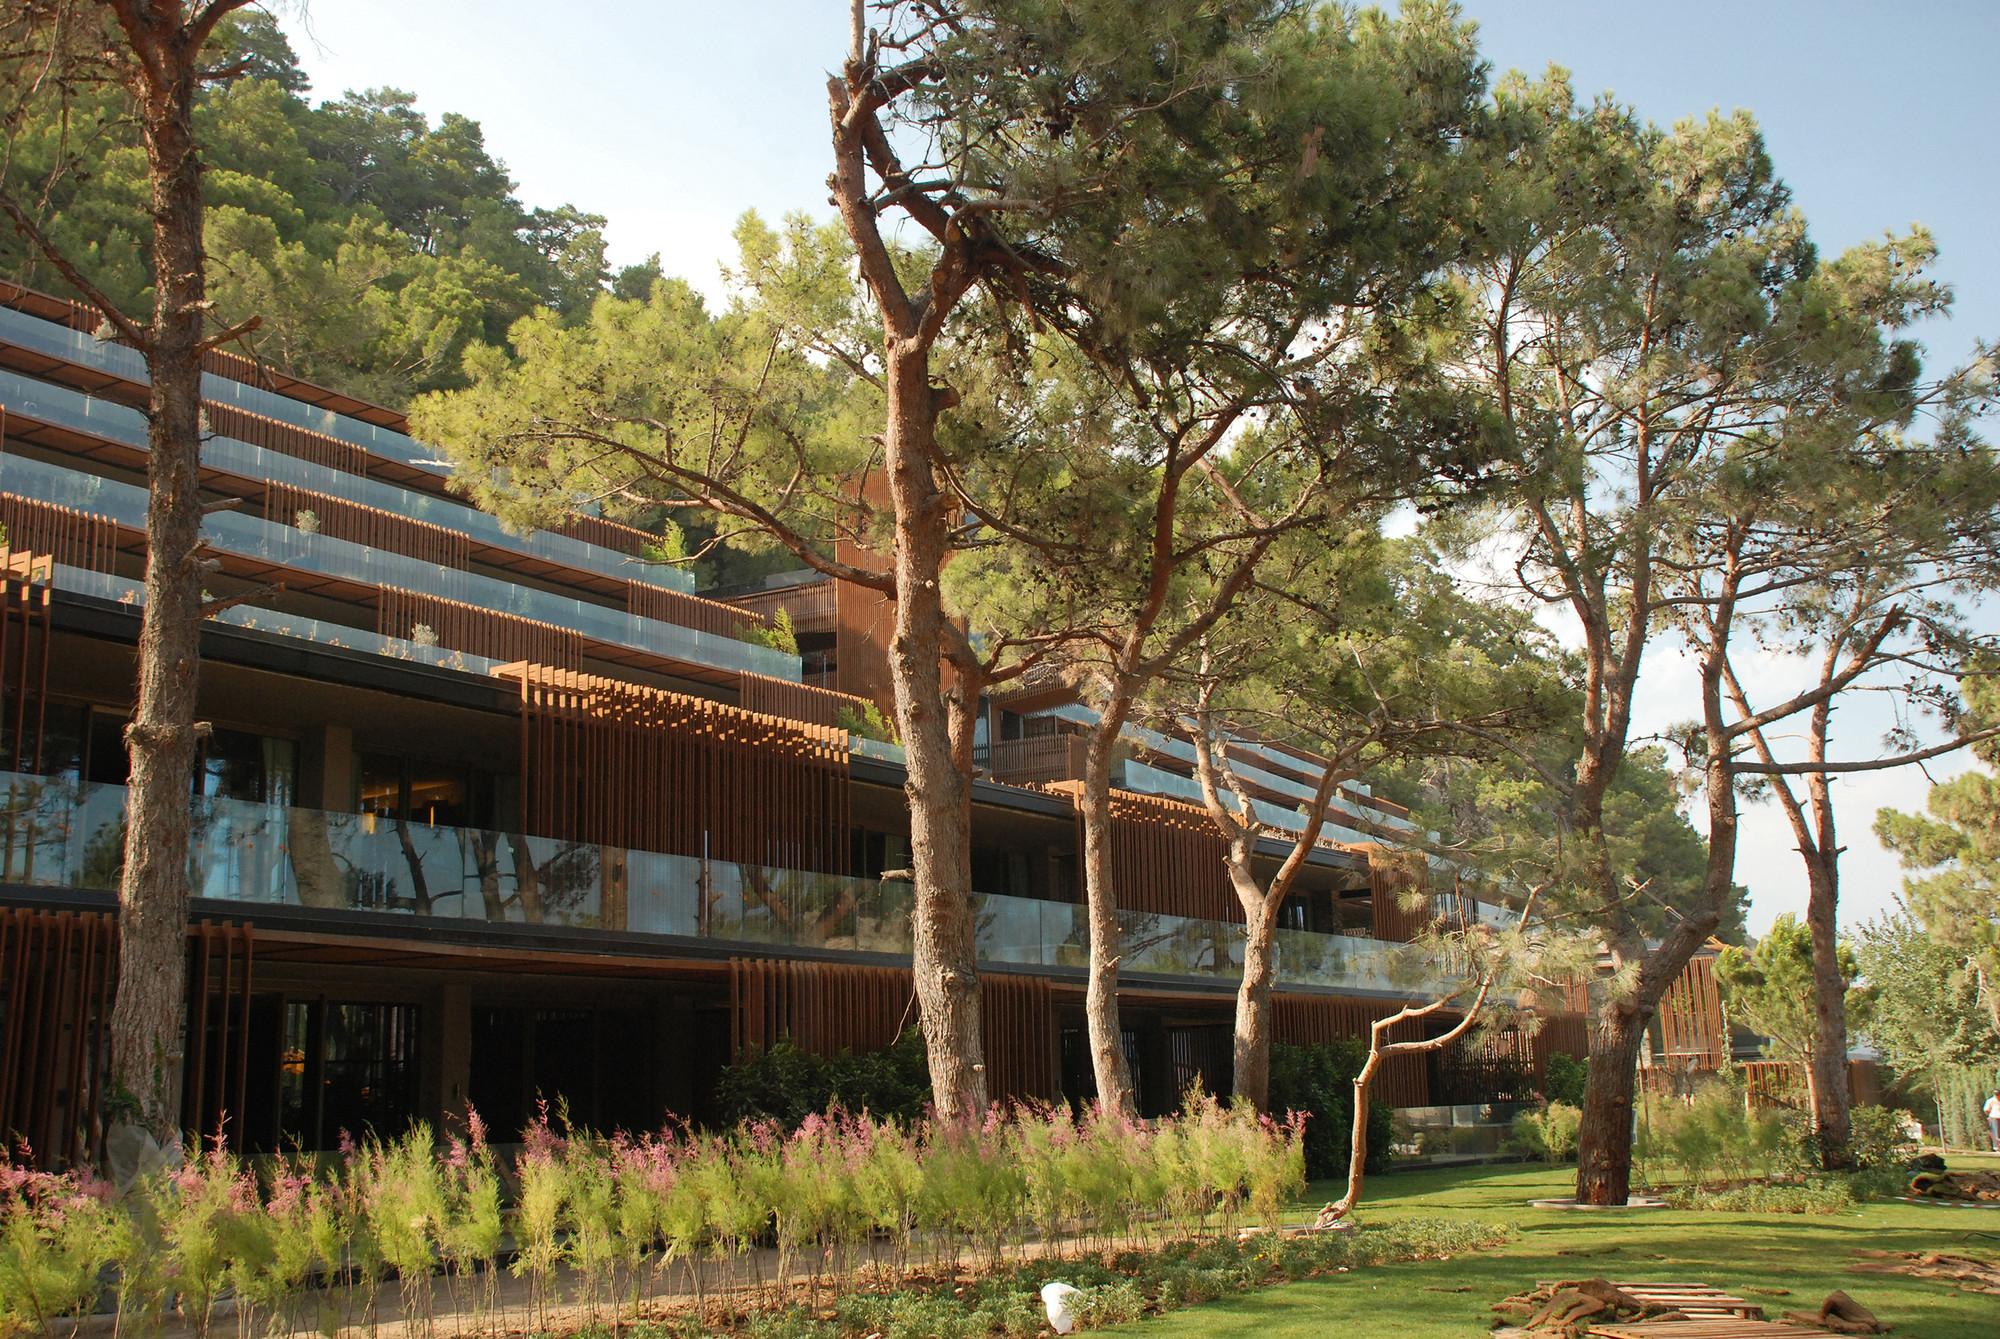 Maxx oyal Kemer Hotel / Baraka rchitects rchDaily - ^